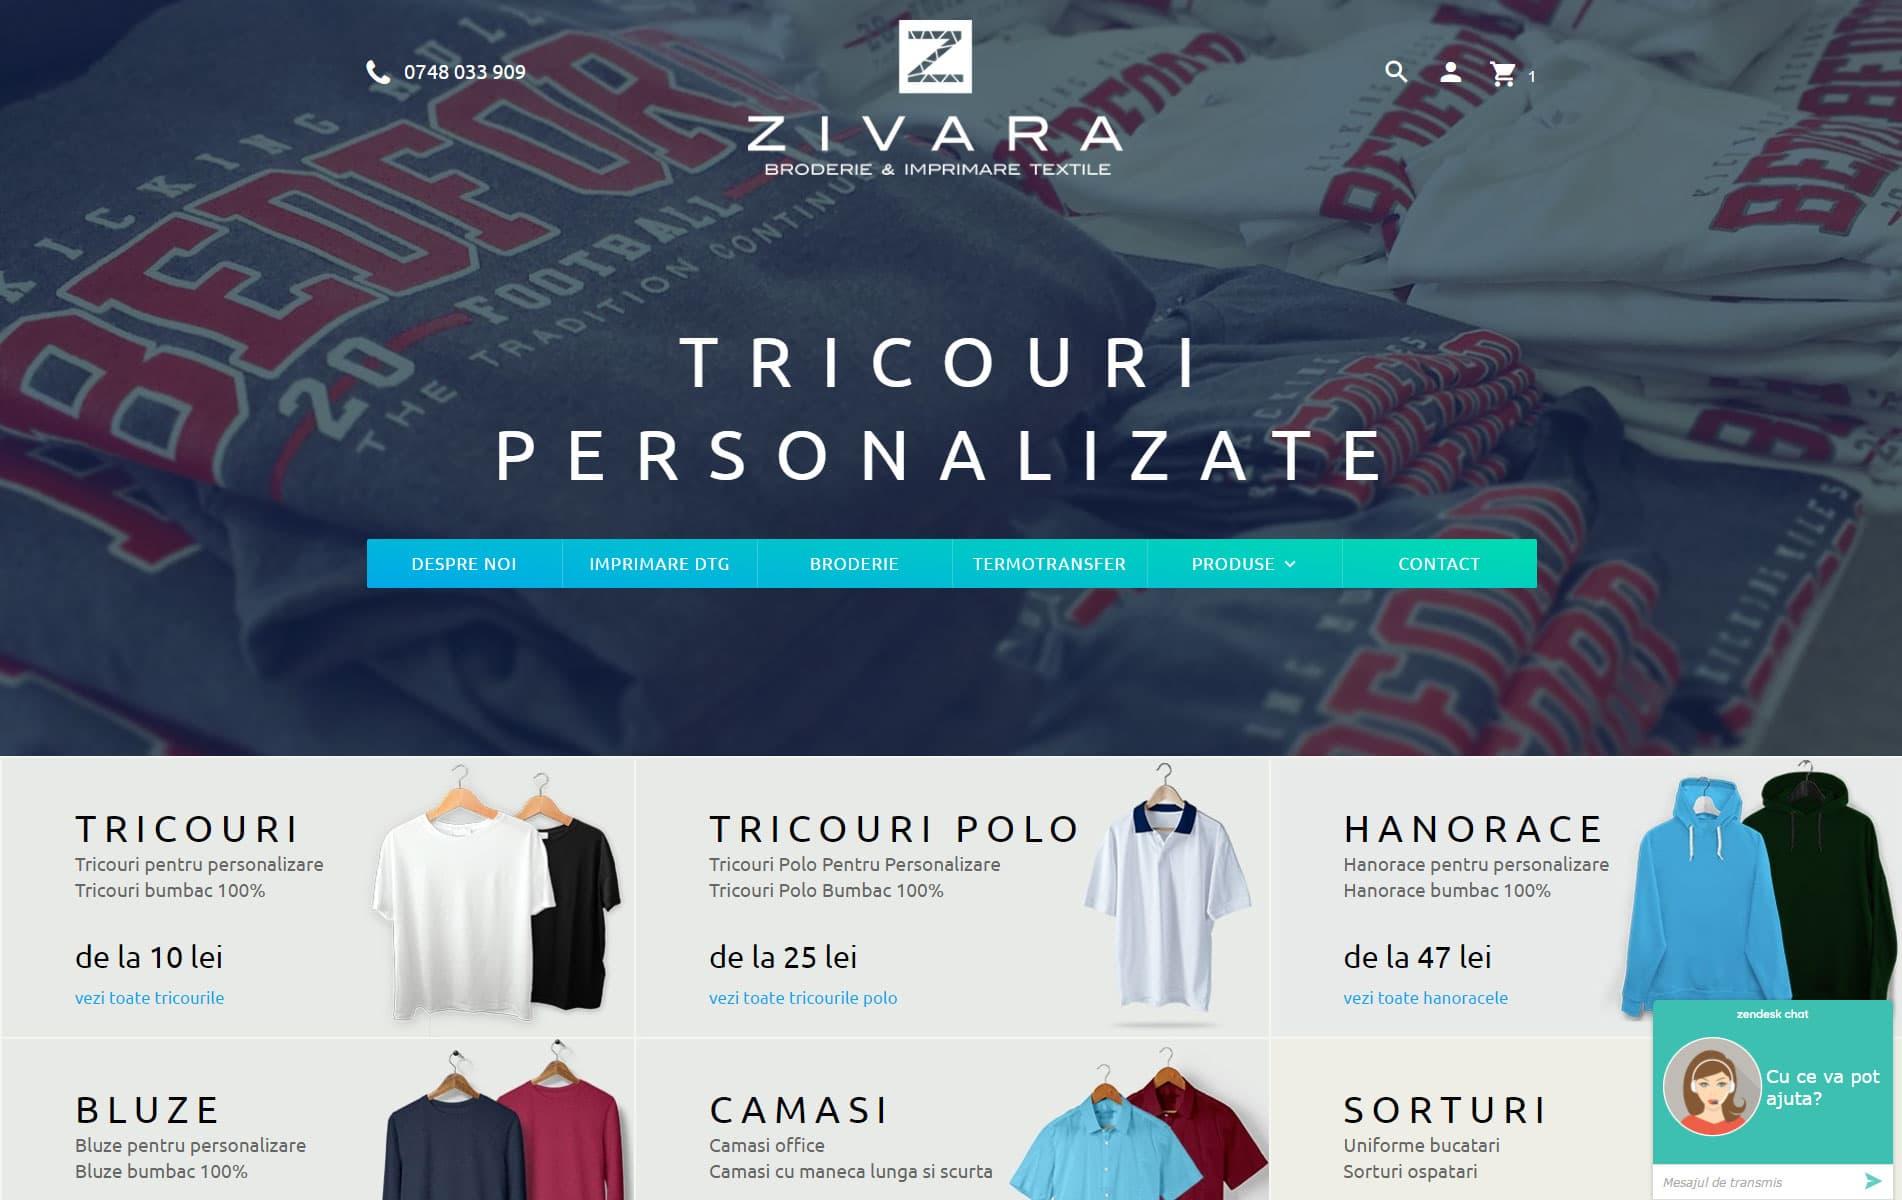 Tricouri, hanorace, bluze, camasi, sepci personalizate - Zivara